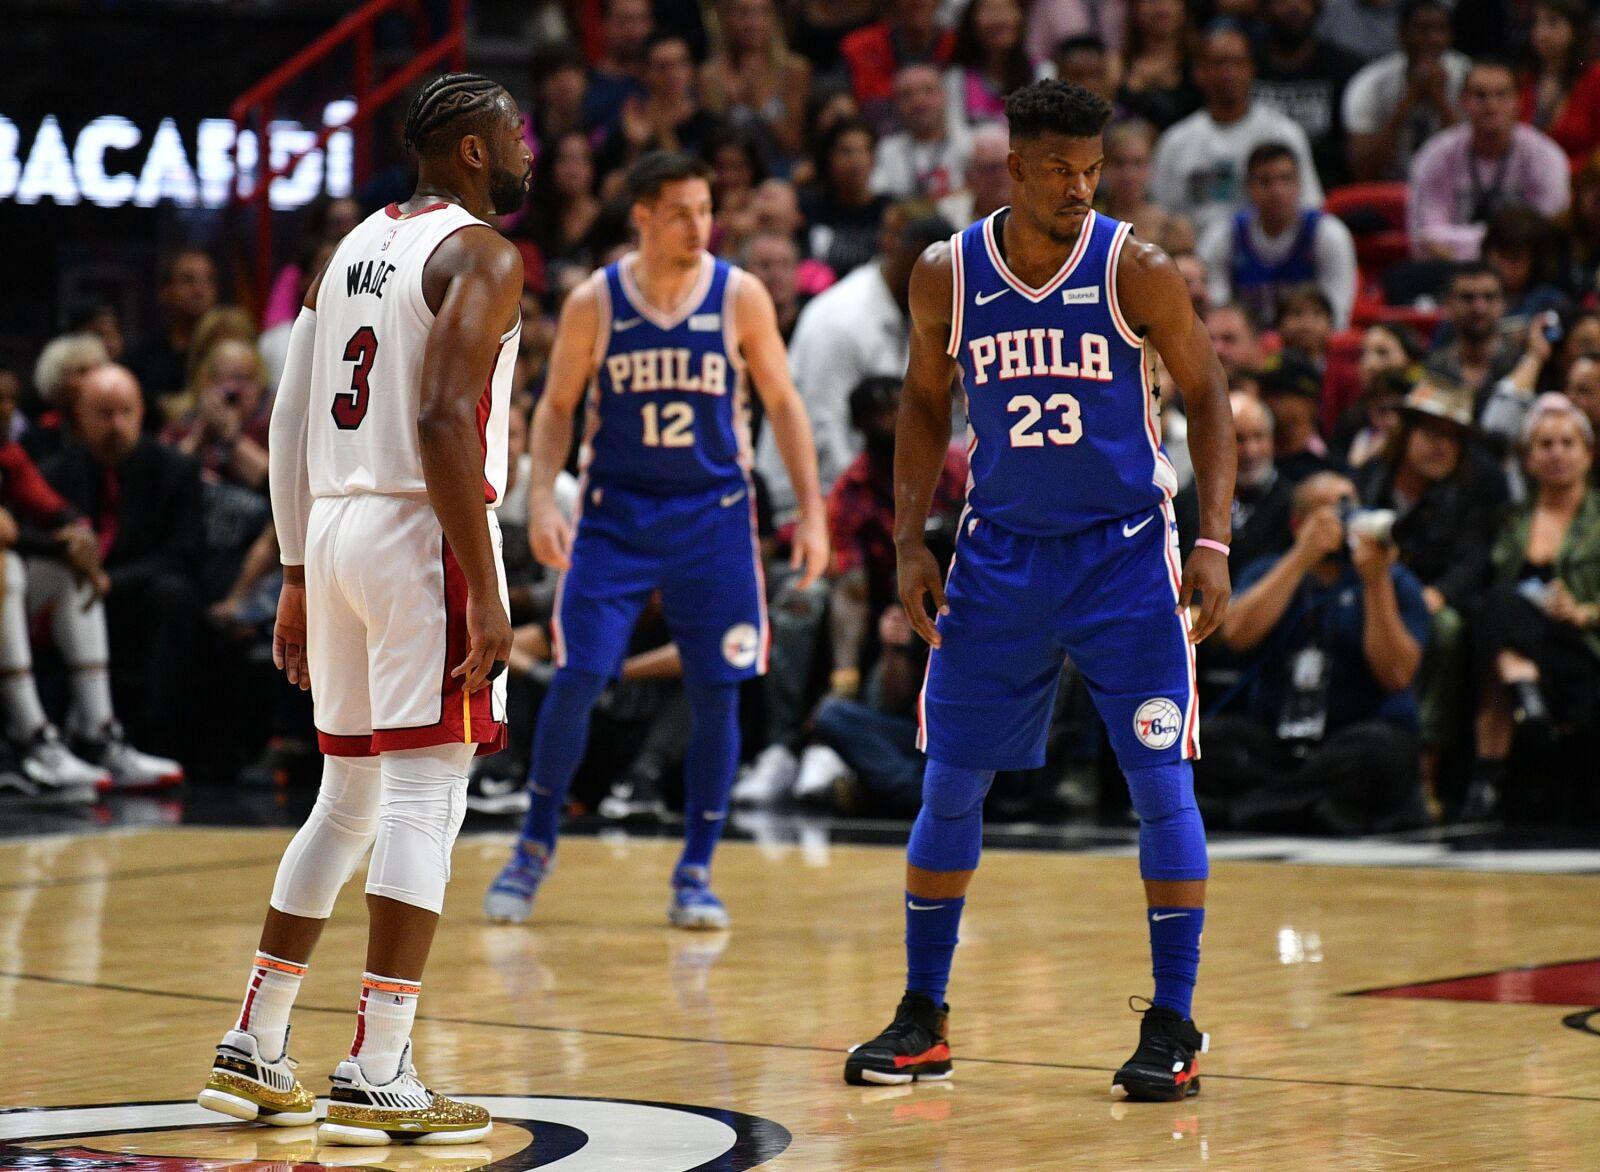 Miami Heat make the cut in CBS Sports' top 10 NBA offseasons